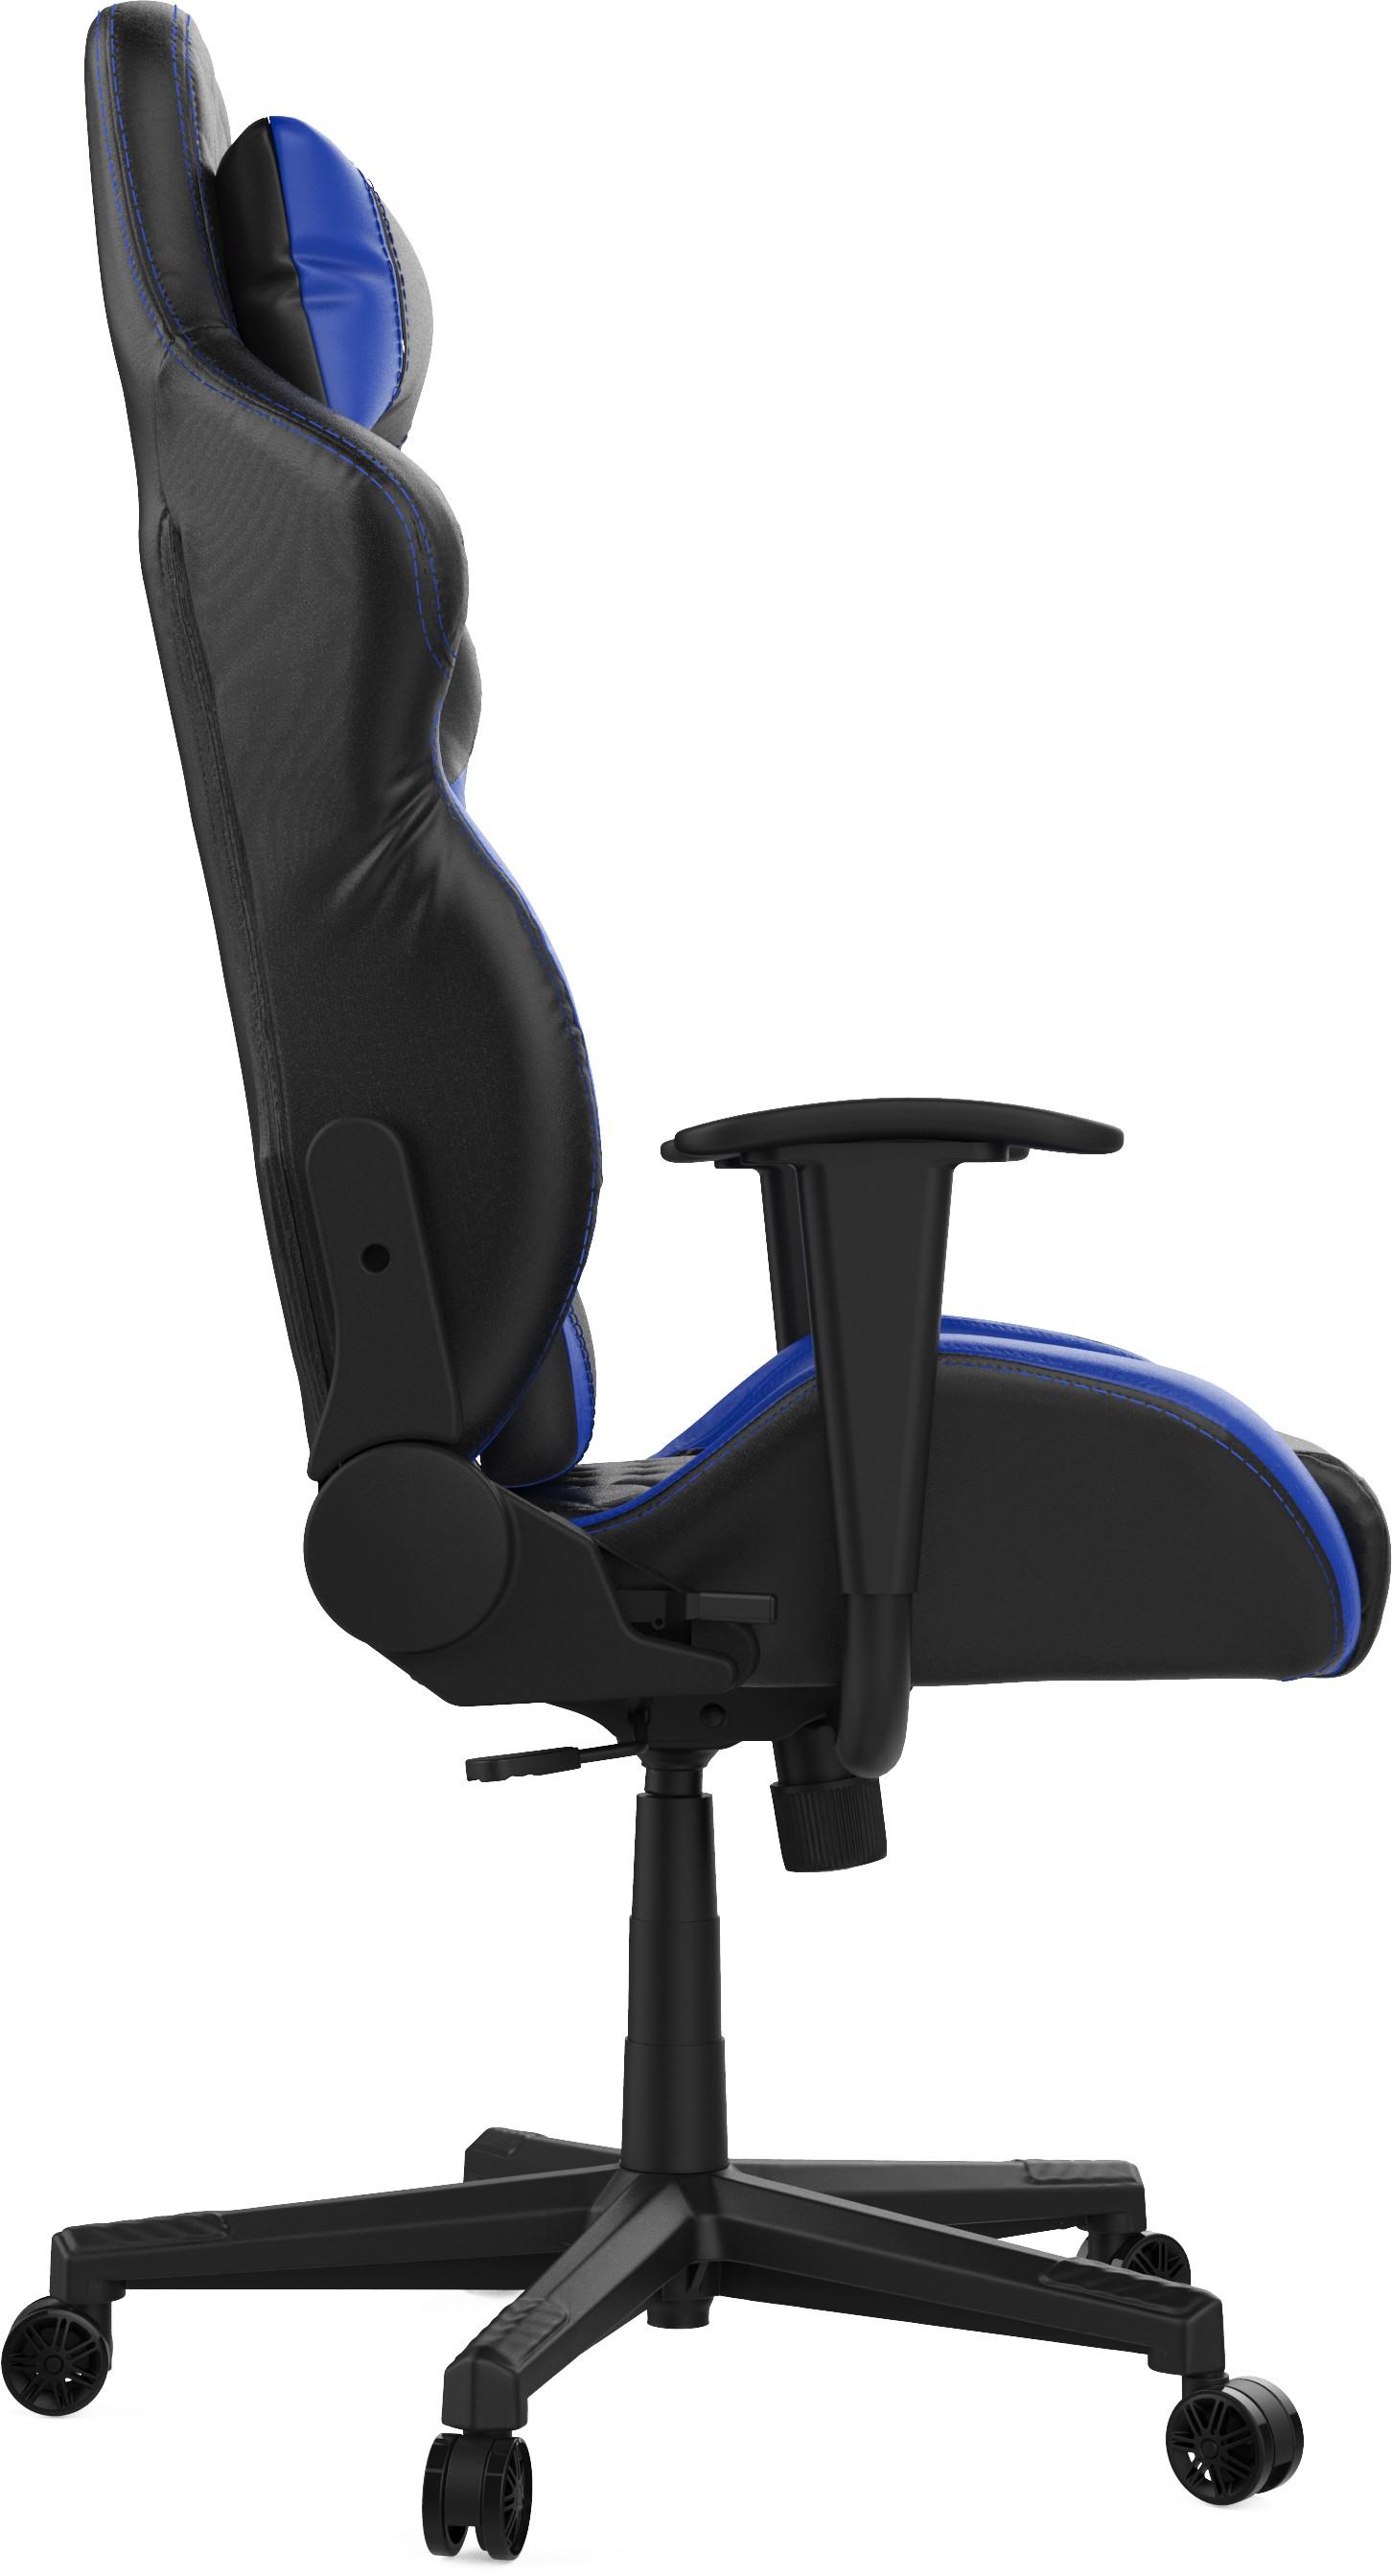 GAMDIAS ZELUS E1 L BB Gaming Chair